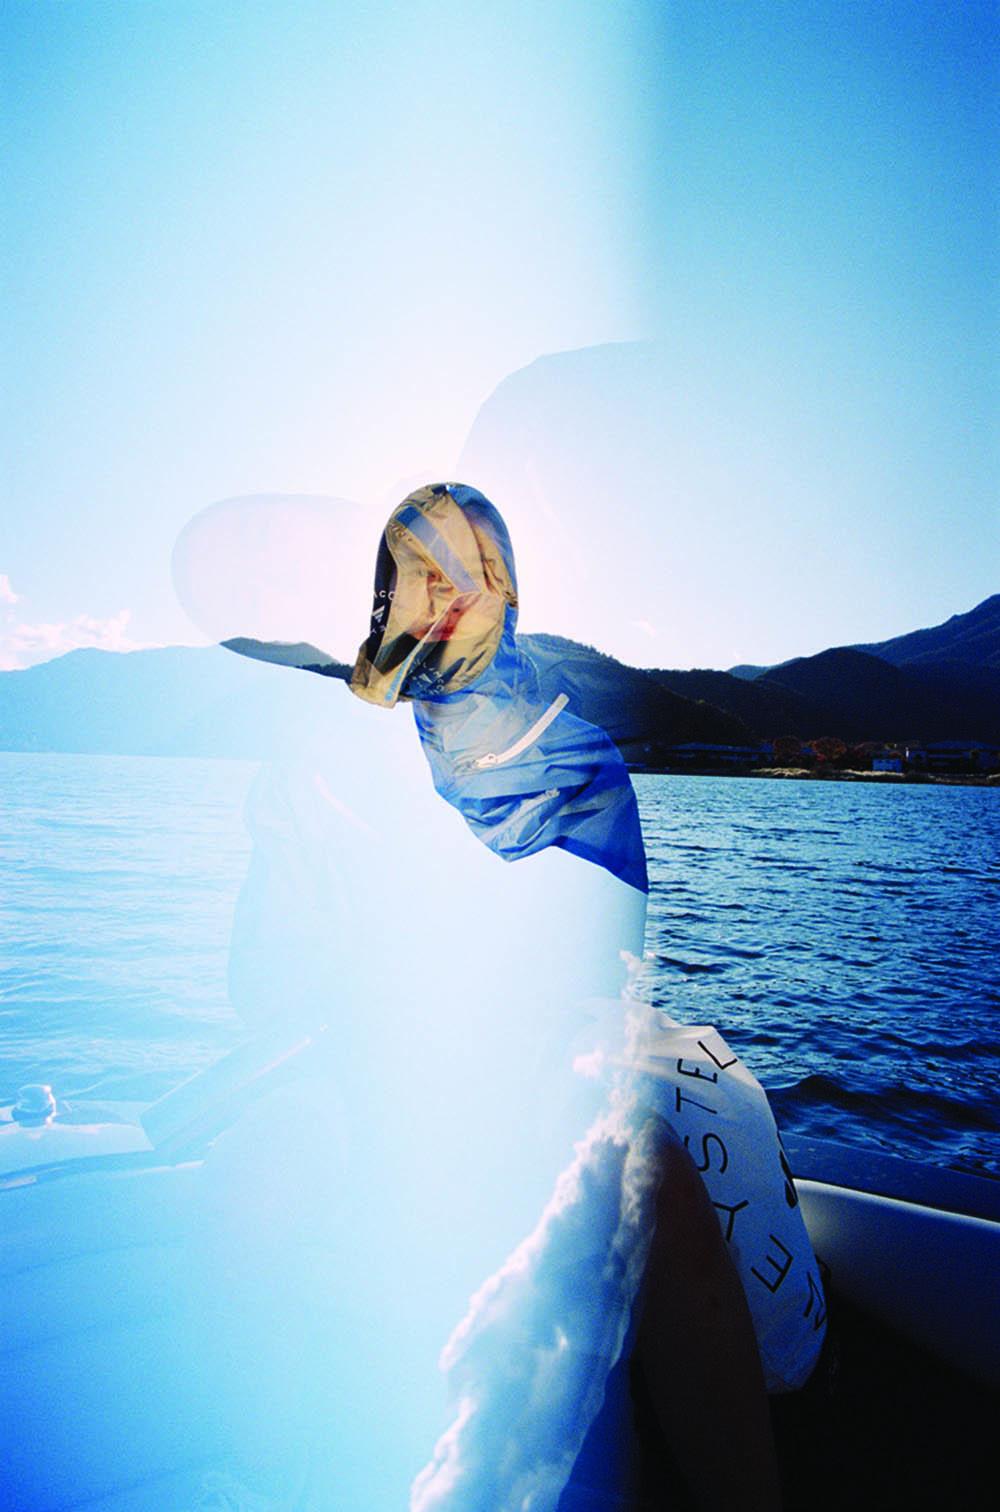 adidas by Stella McCartney unveils Beach Defender collection